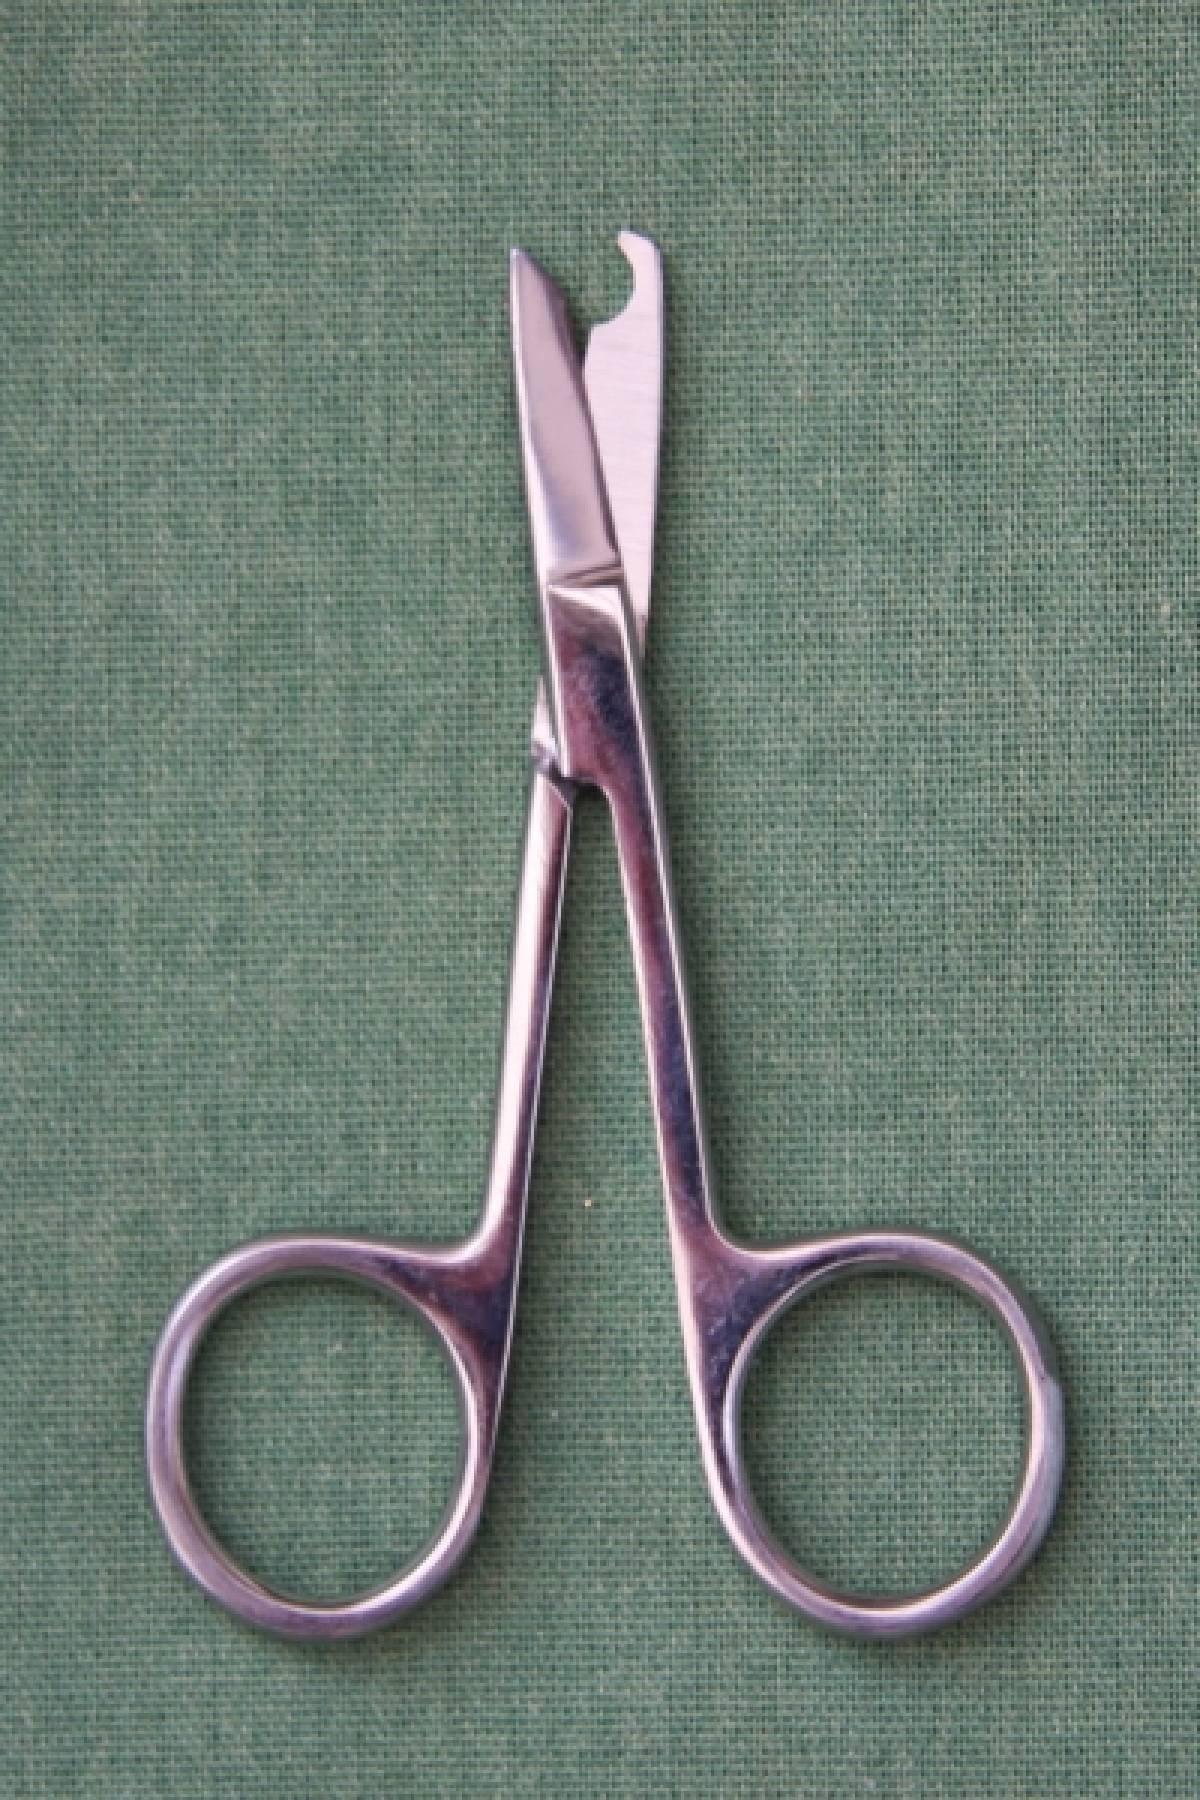 Lift and Snip Scissors